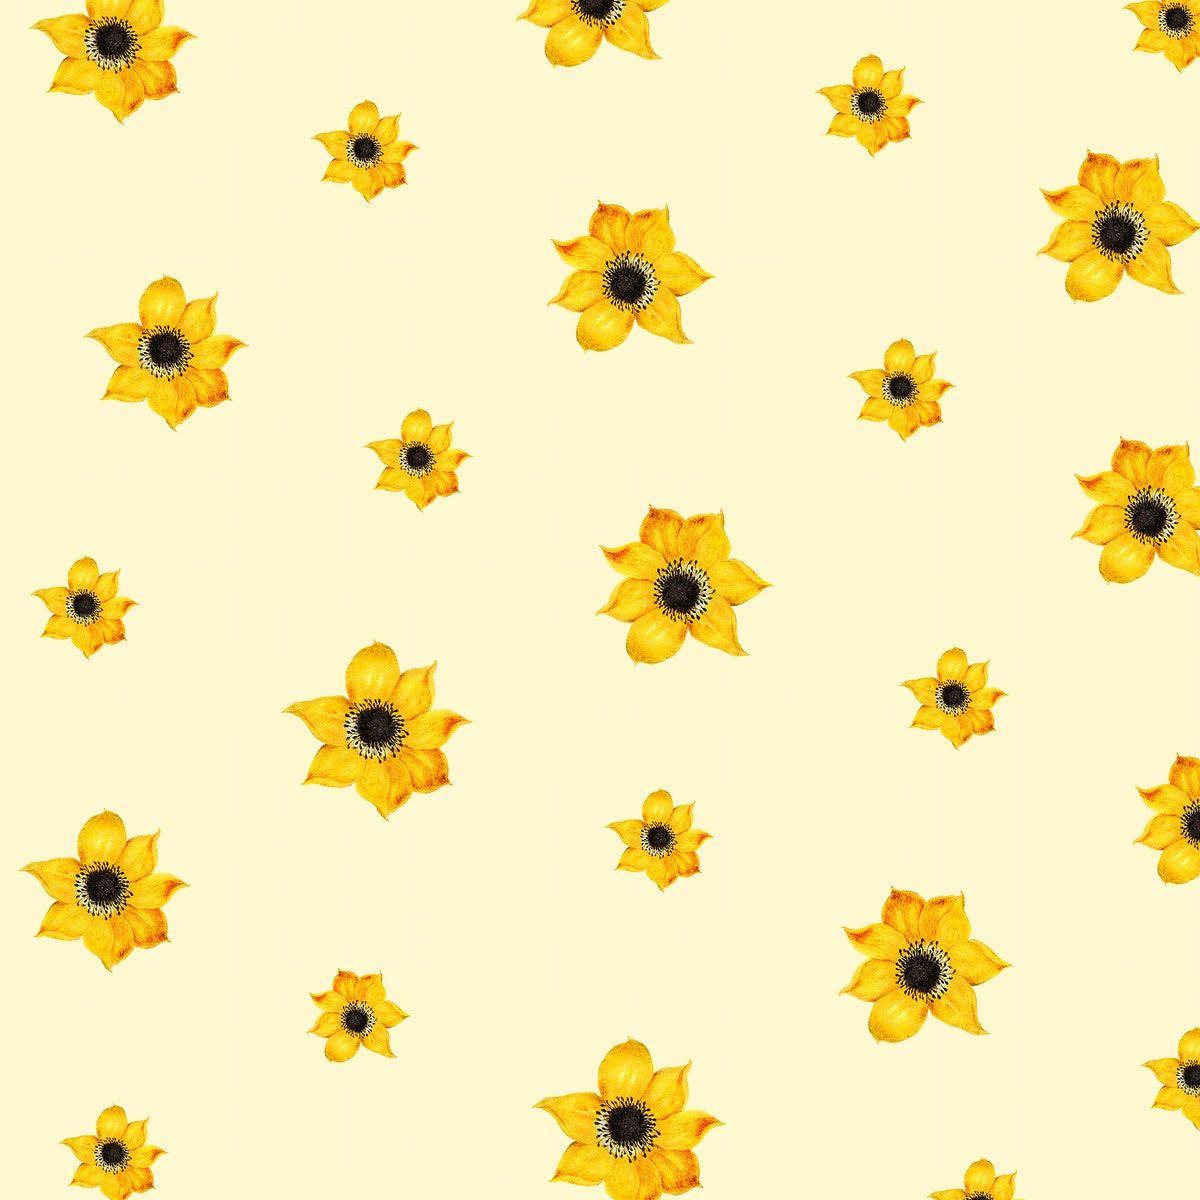 Download Premium Illustration Of Vintage Yellow Flower Pattern Background In 2020 Background Patterns Background Design Vintage Yellow